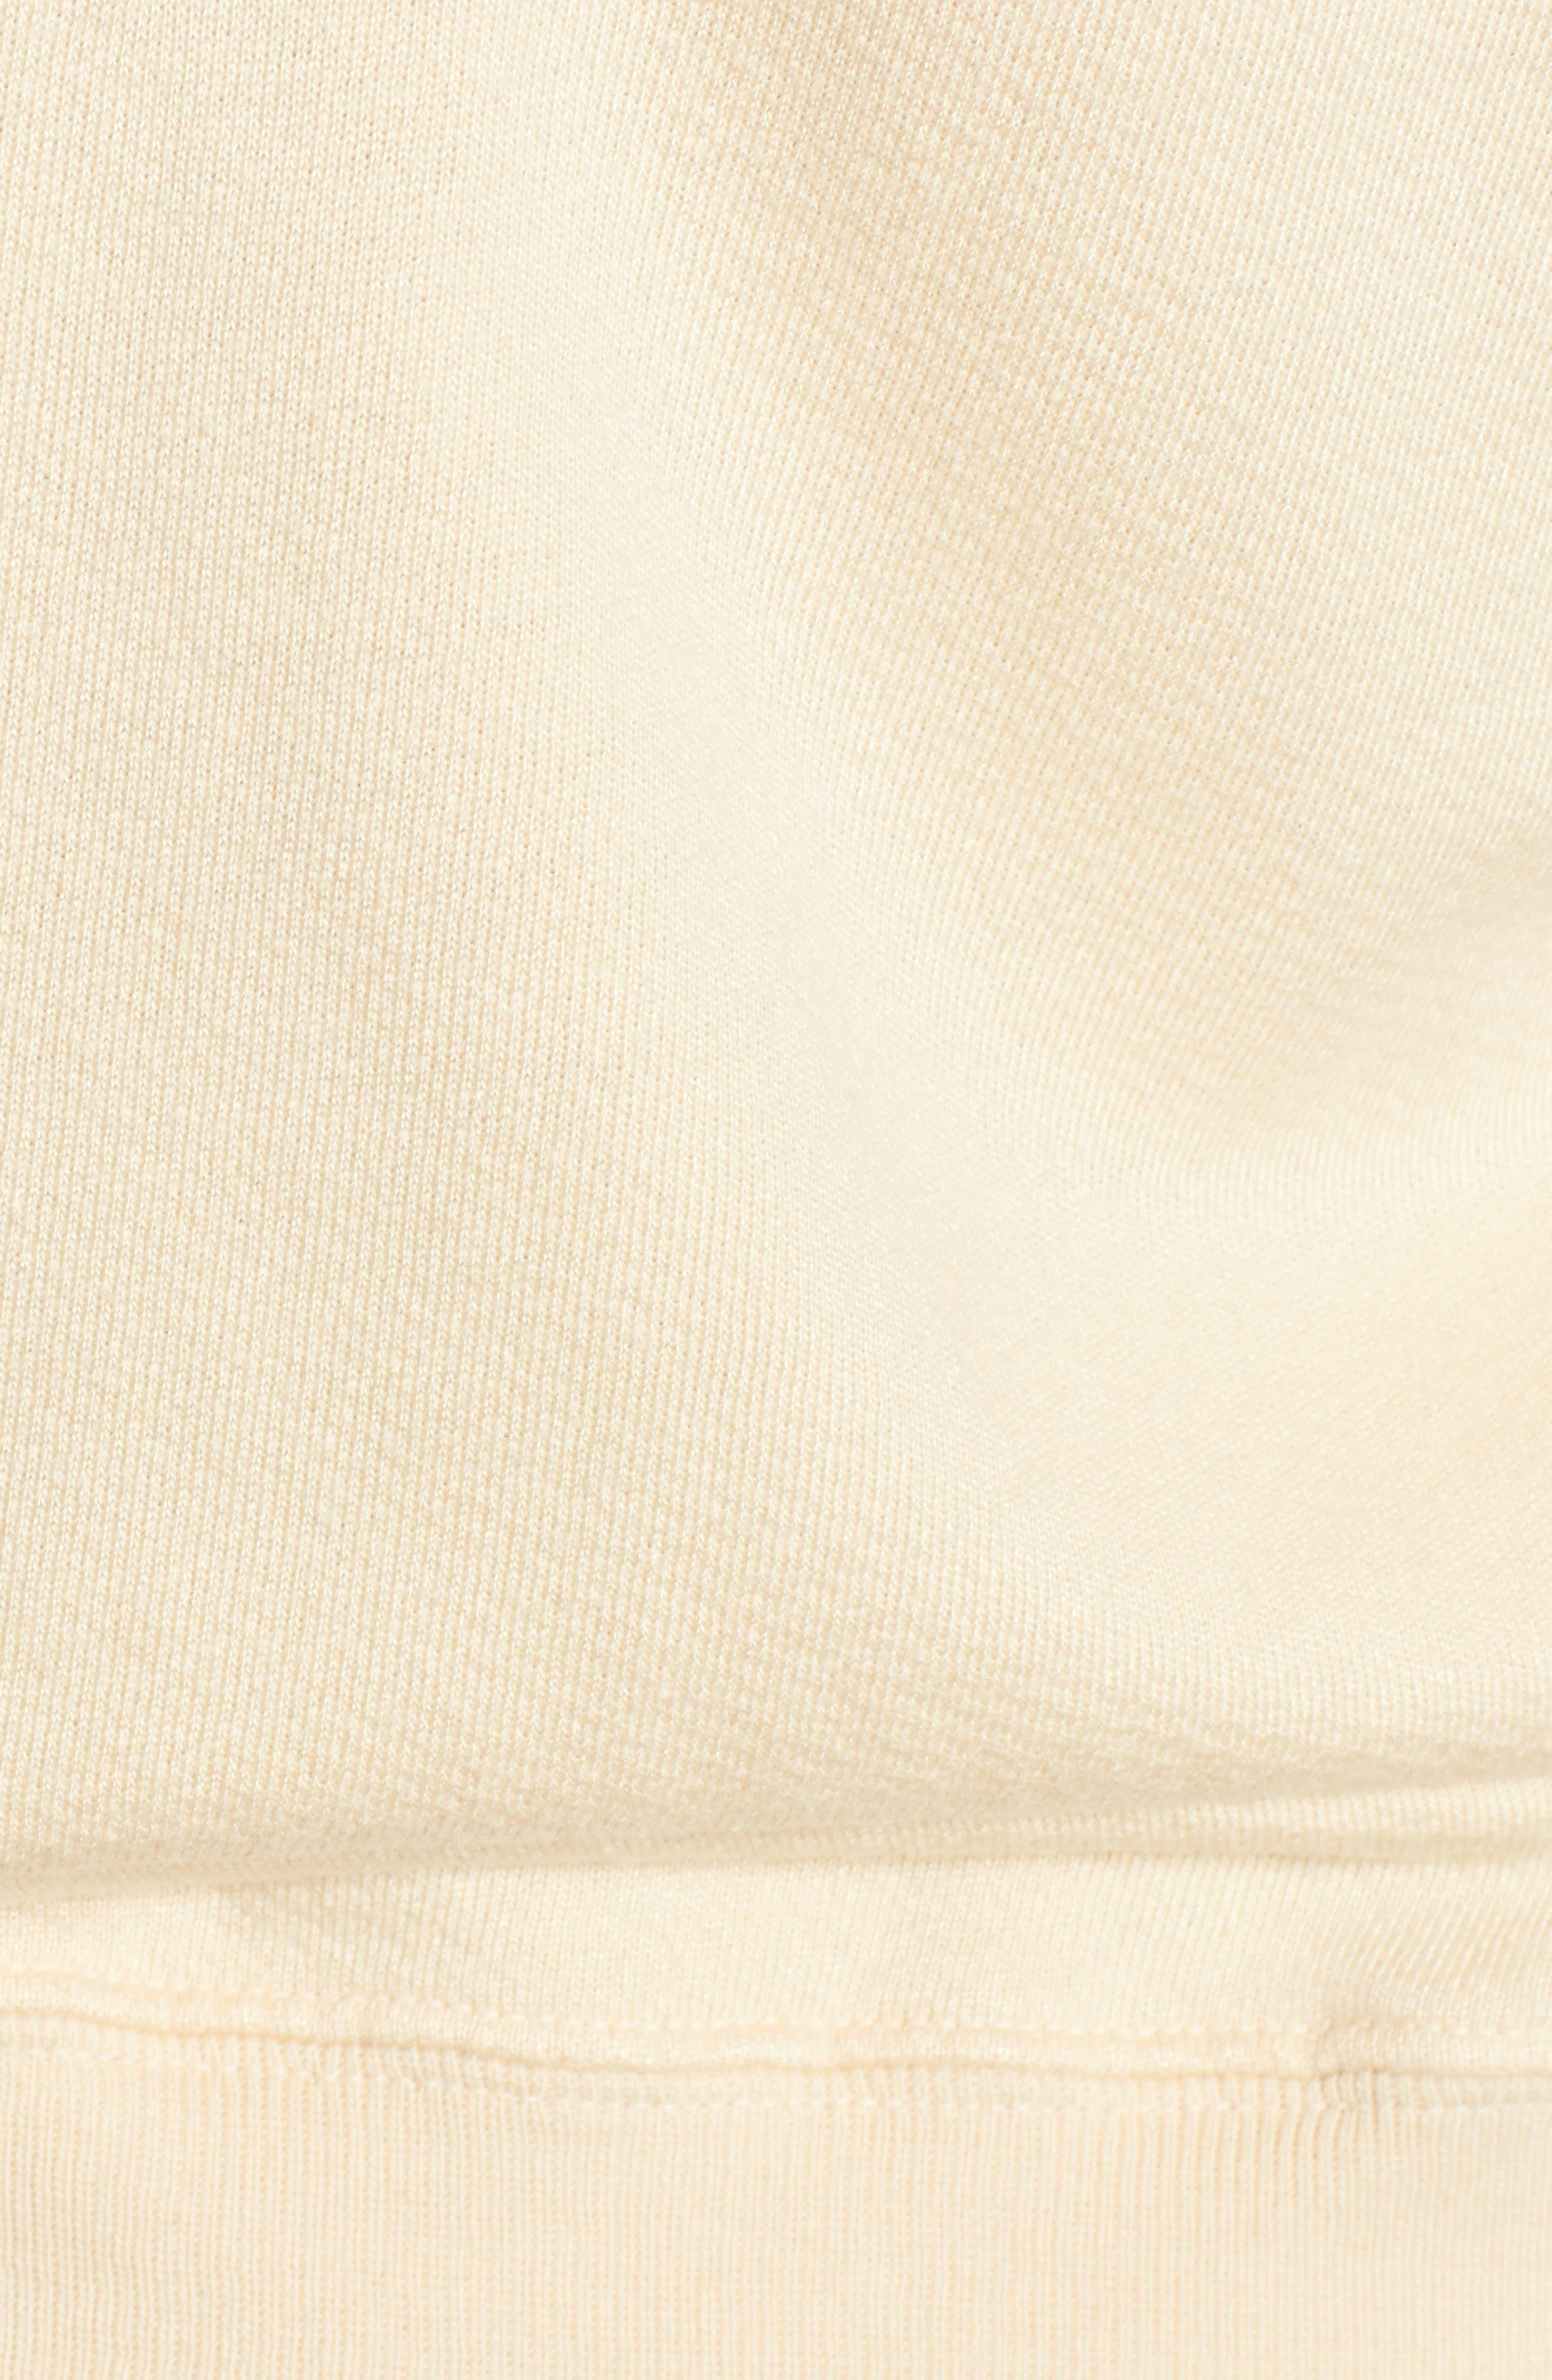 Mayer V-Neck Sweatshirt,                             Alternate thumbnail 5, color,                             Citrus Dust